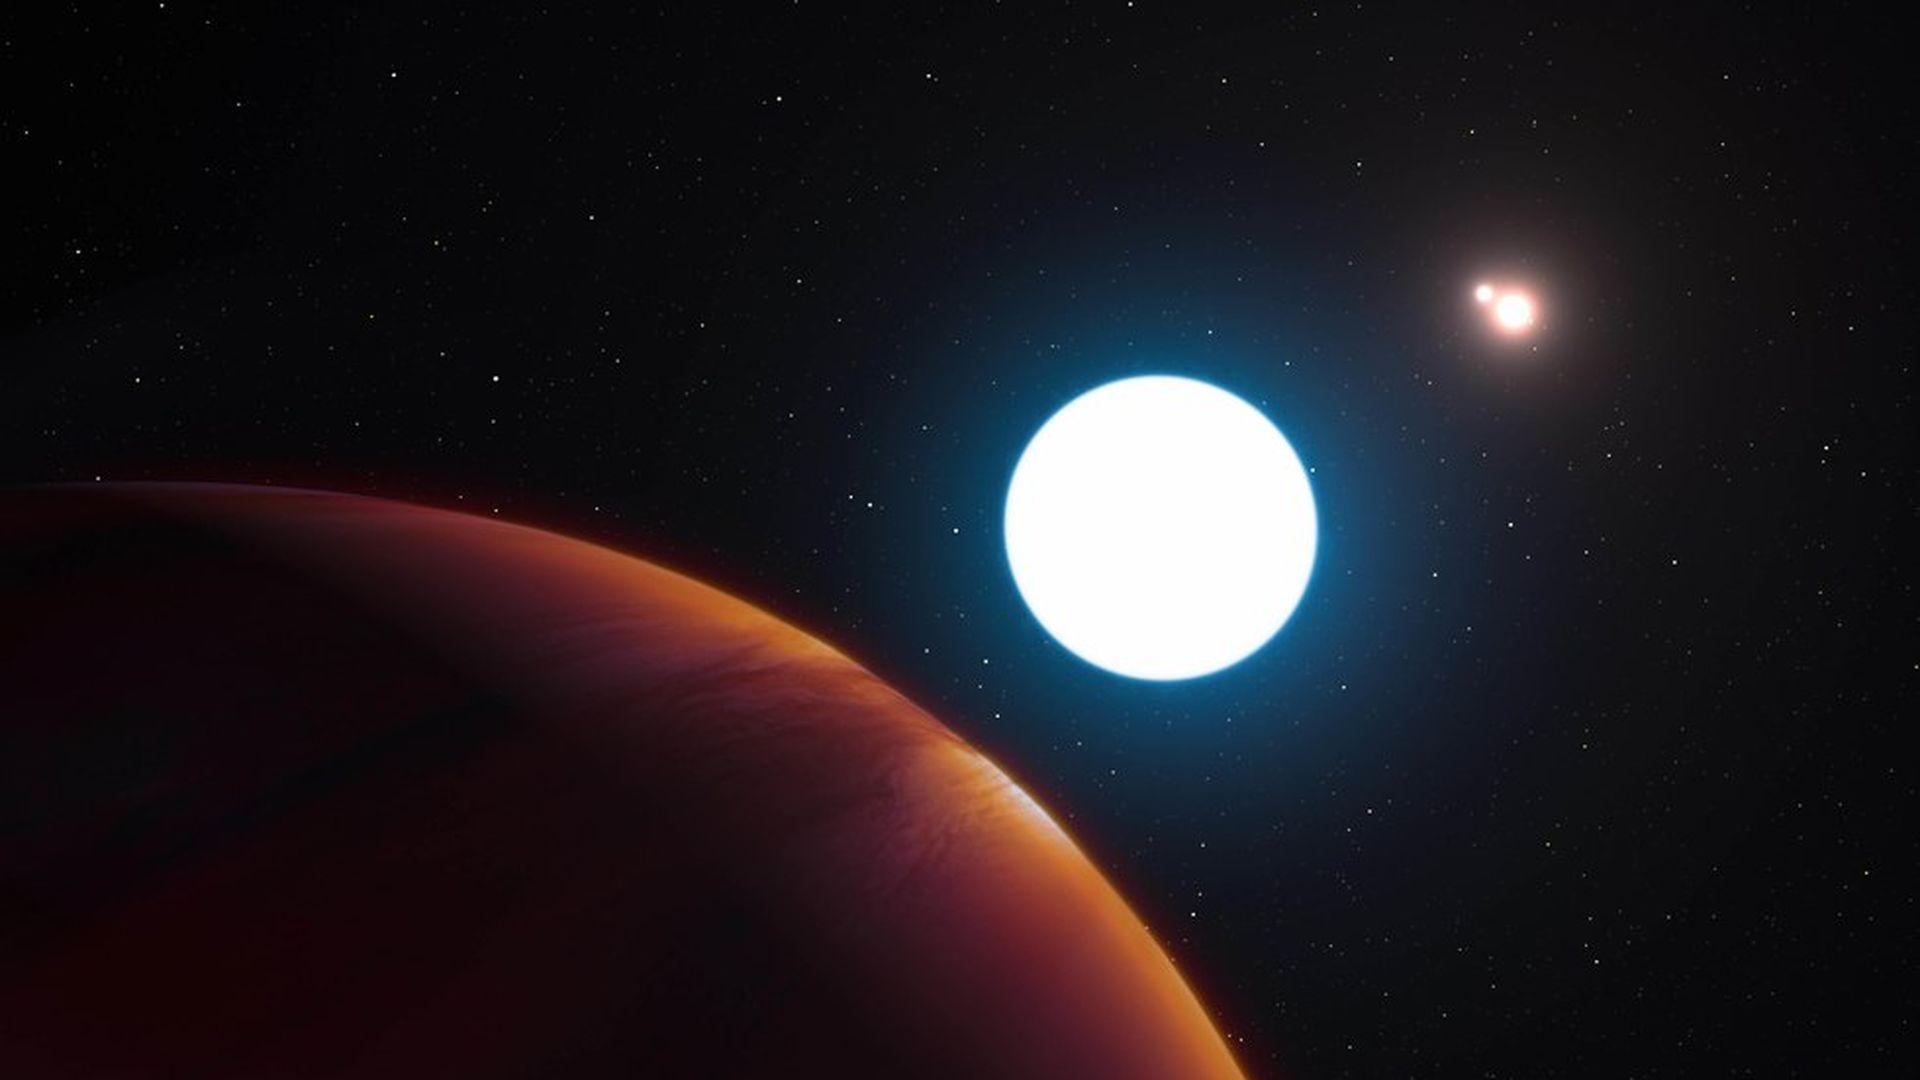 How a musical rhythm keeps 7 planets in orbit